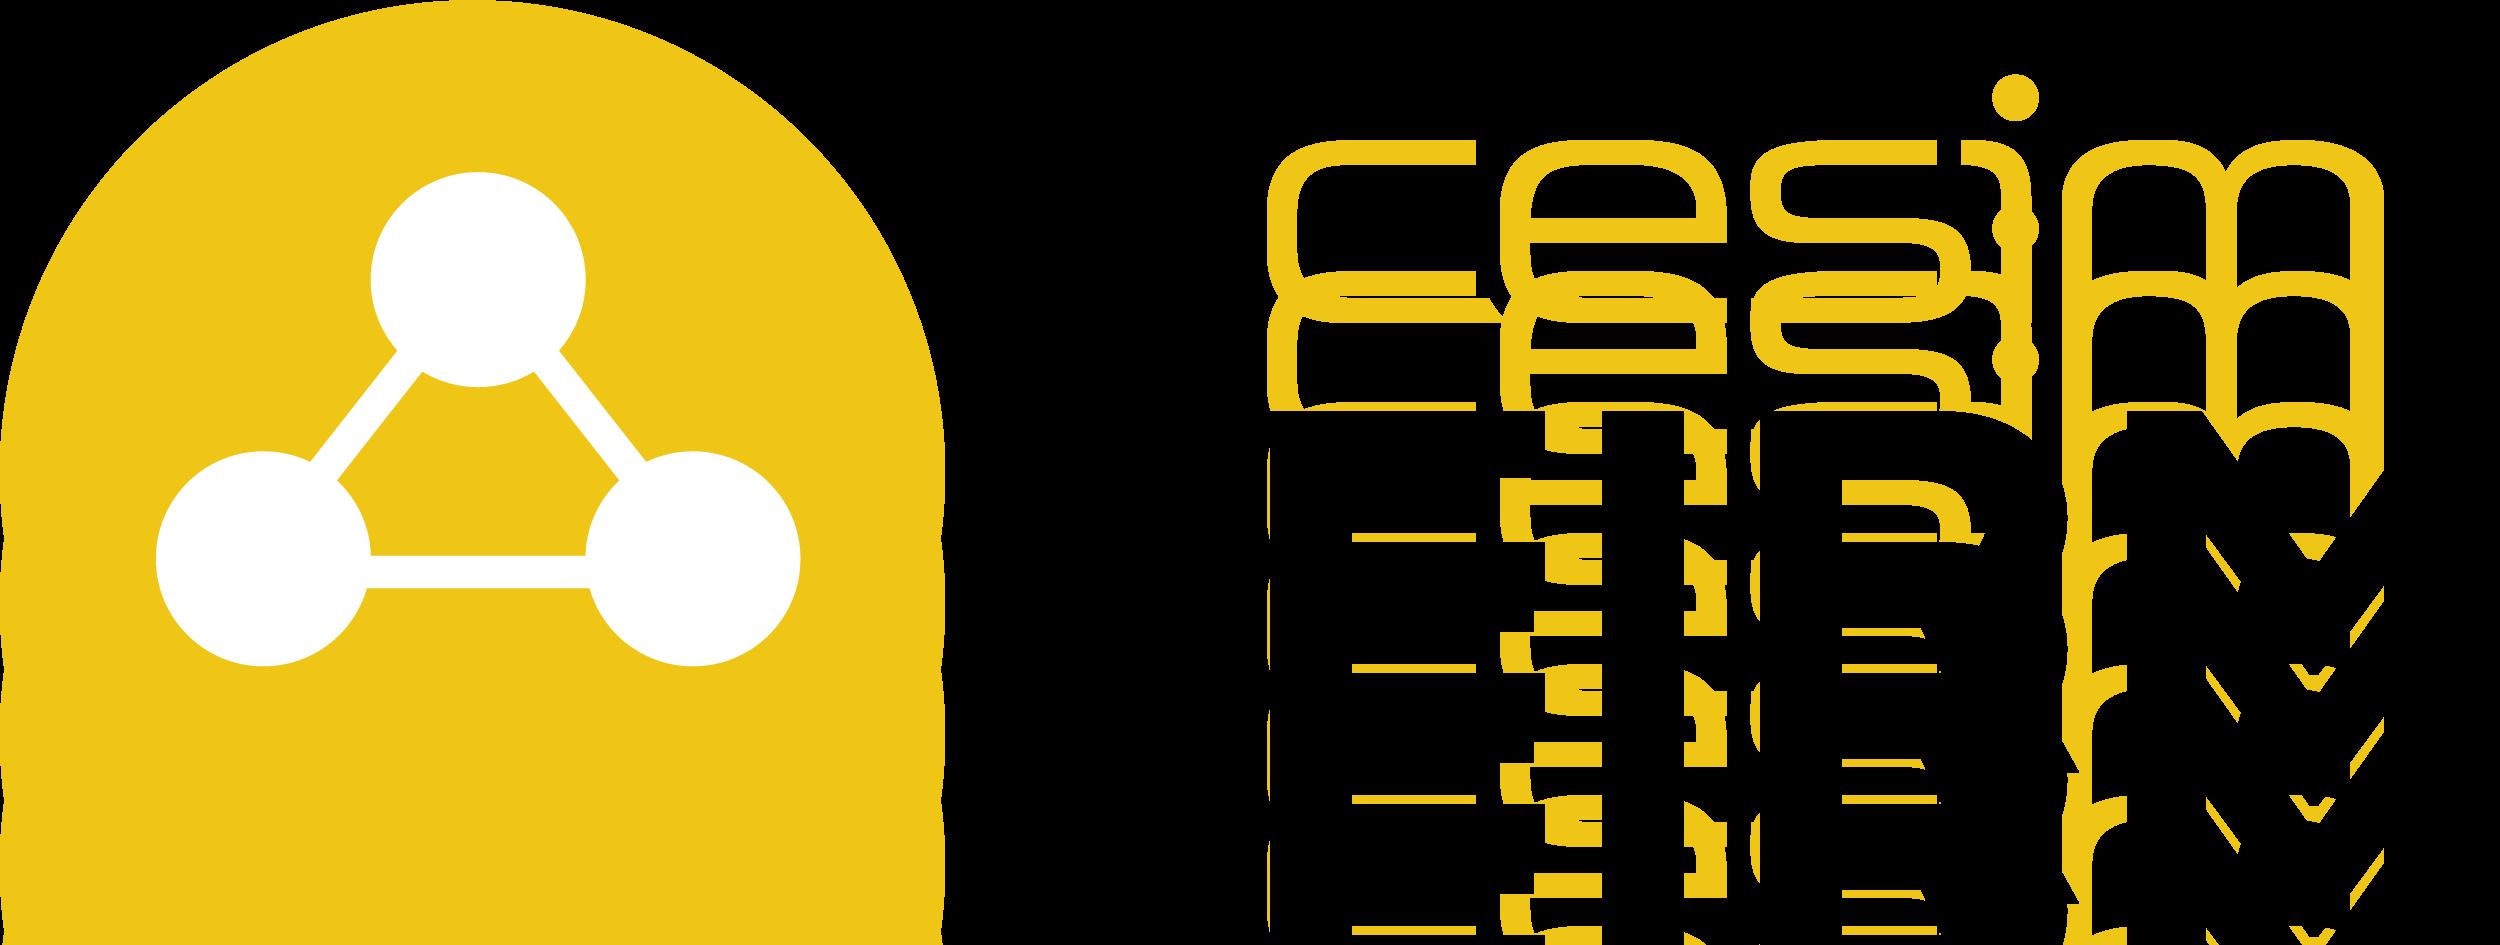 Cesim SimFirm - General management planspiel